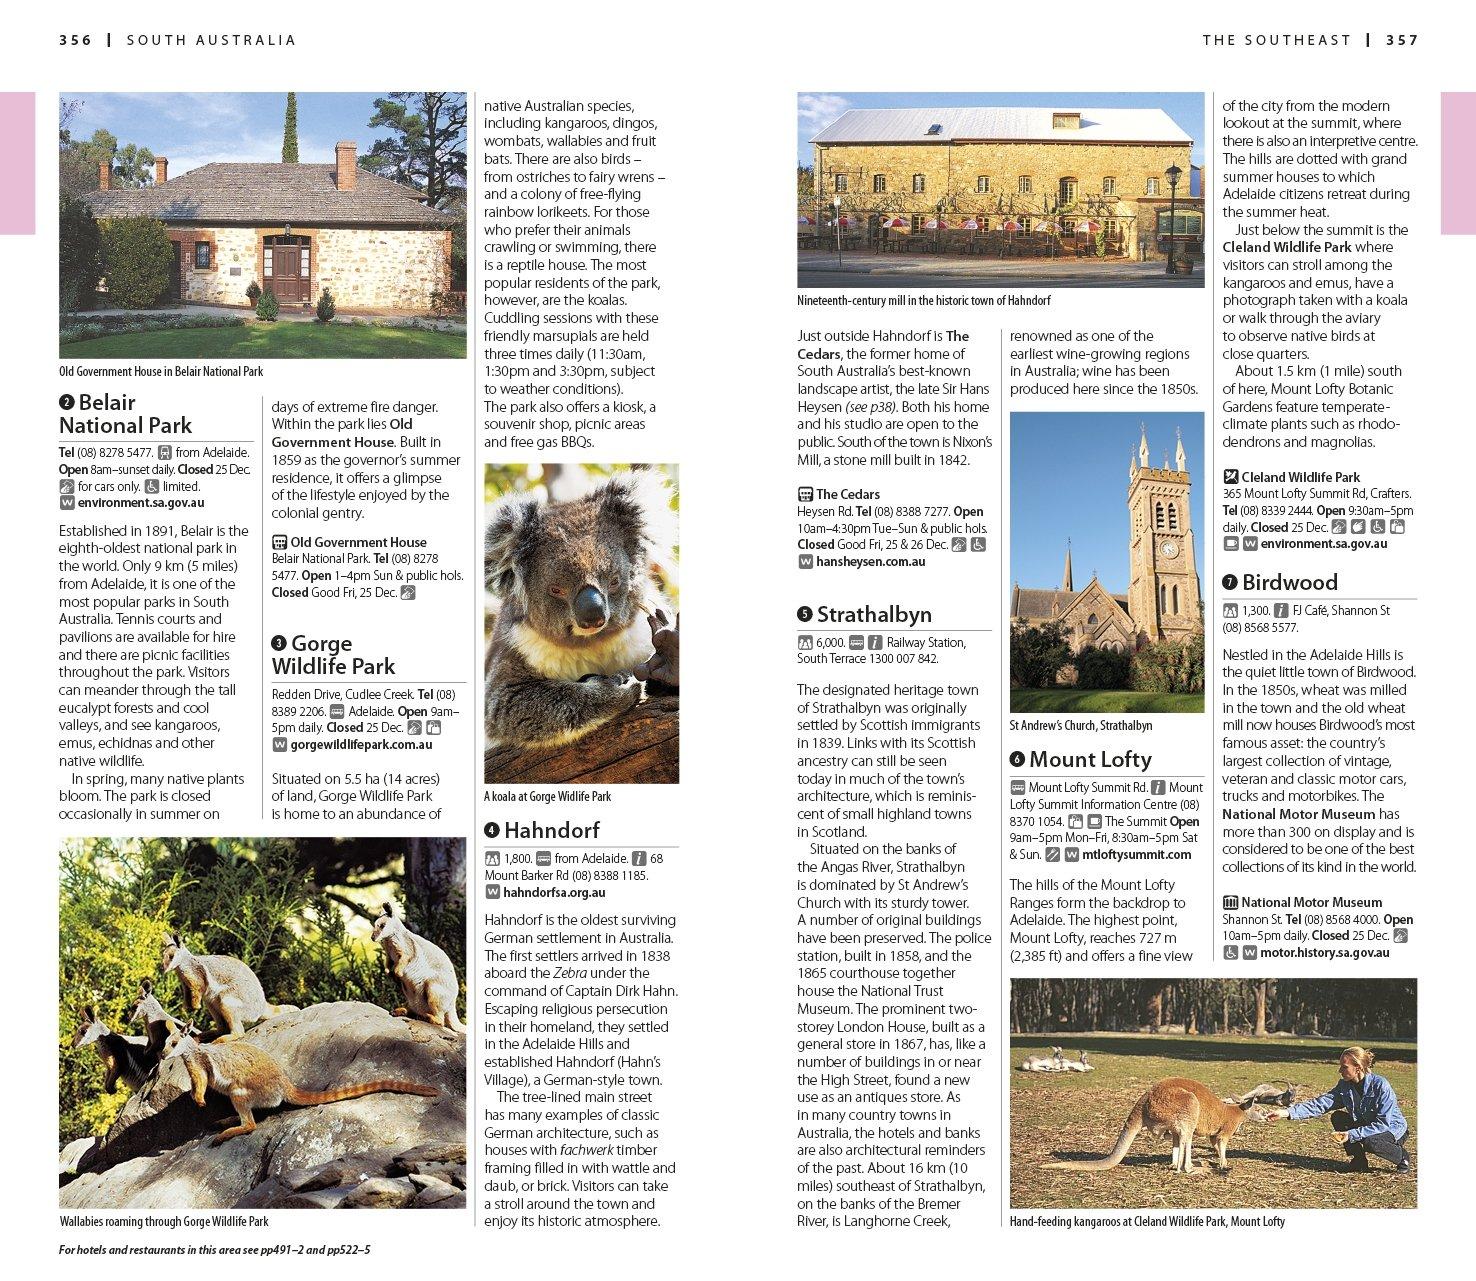 DK Eyewitness Travel Guide Australia - 91pYkR ZAaL - Getting Down Under